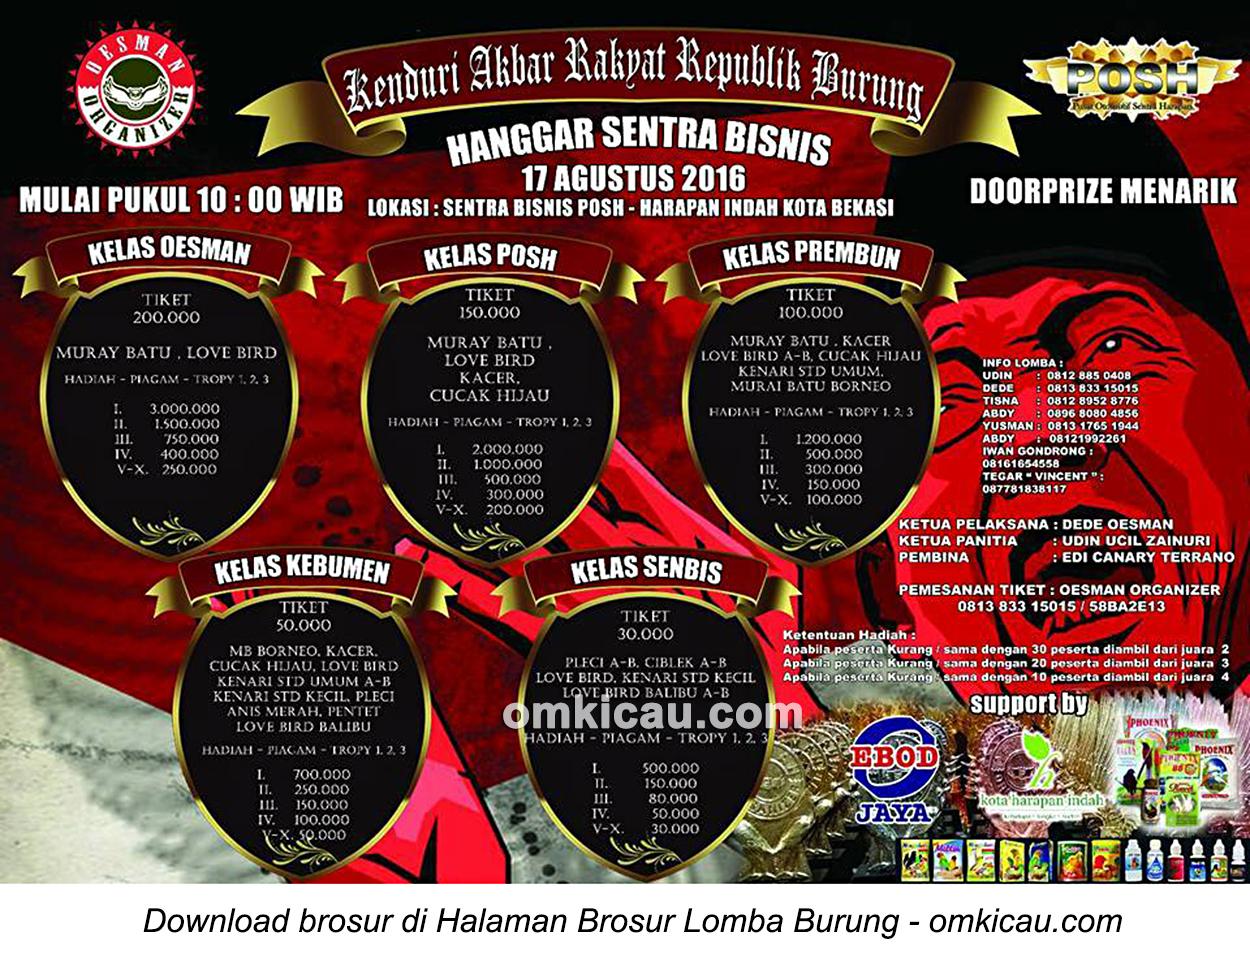 Brosur Lomba Burung Berkicau Hanggar Sentra Bisnis, Bekasi, 17 Agustus 2016